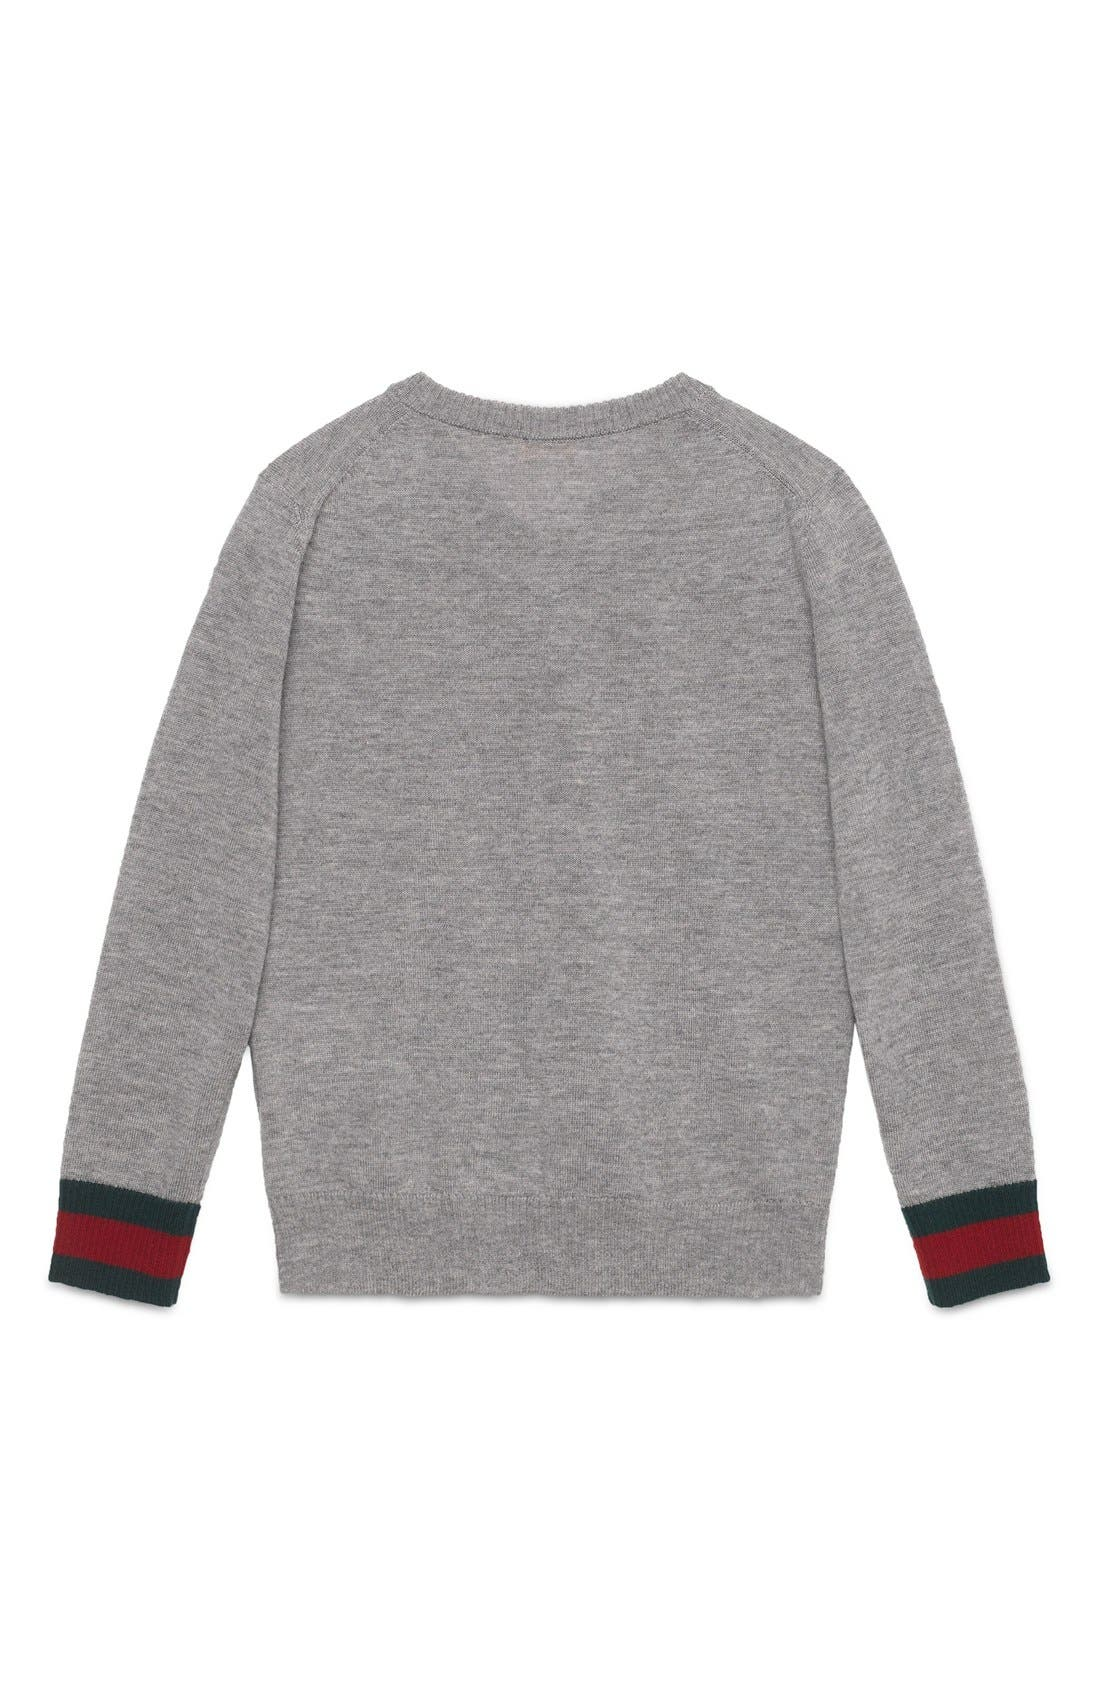 Stripe Cuff V-Neck Merino Wool Sweater,                             Alternate thumbnail 4, color,                             GREY MULTI